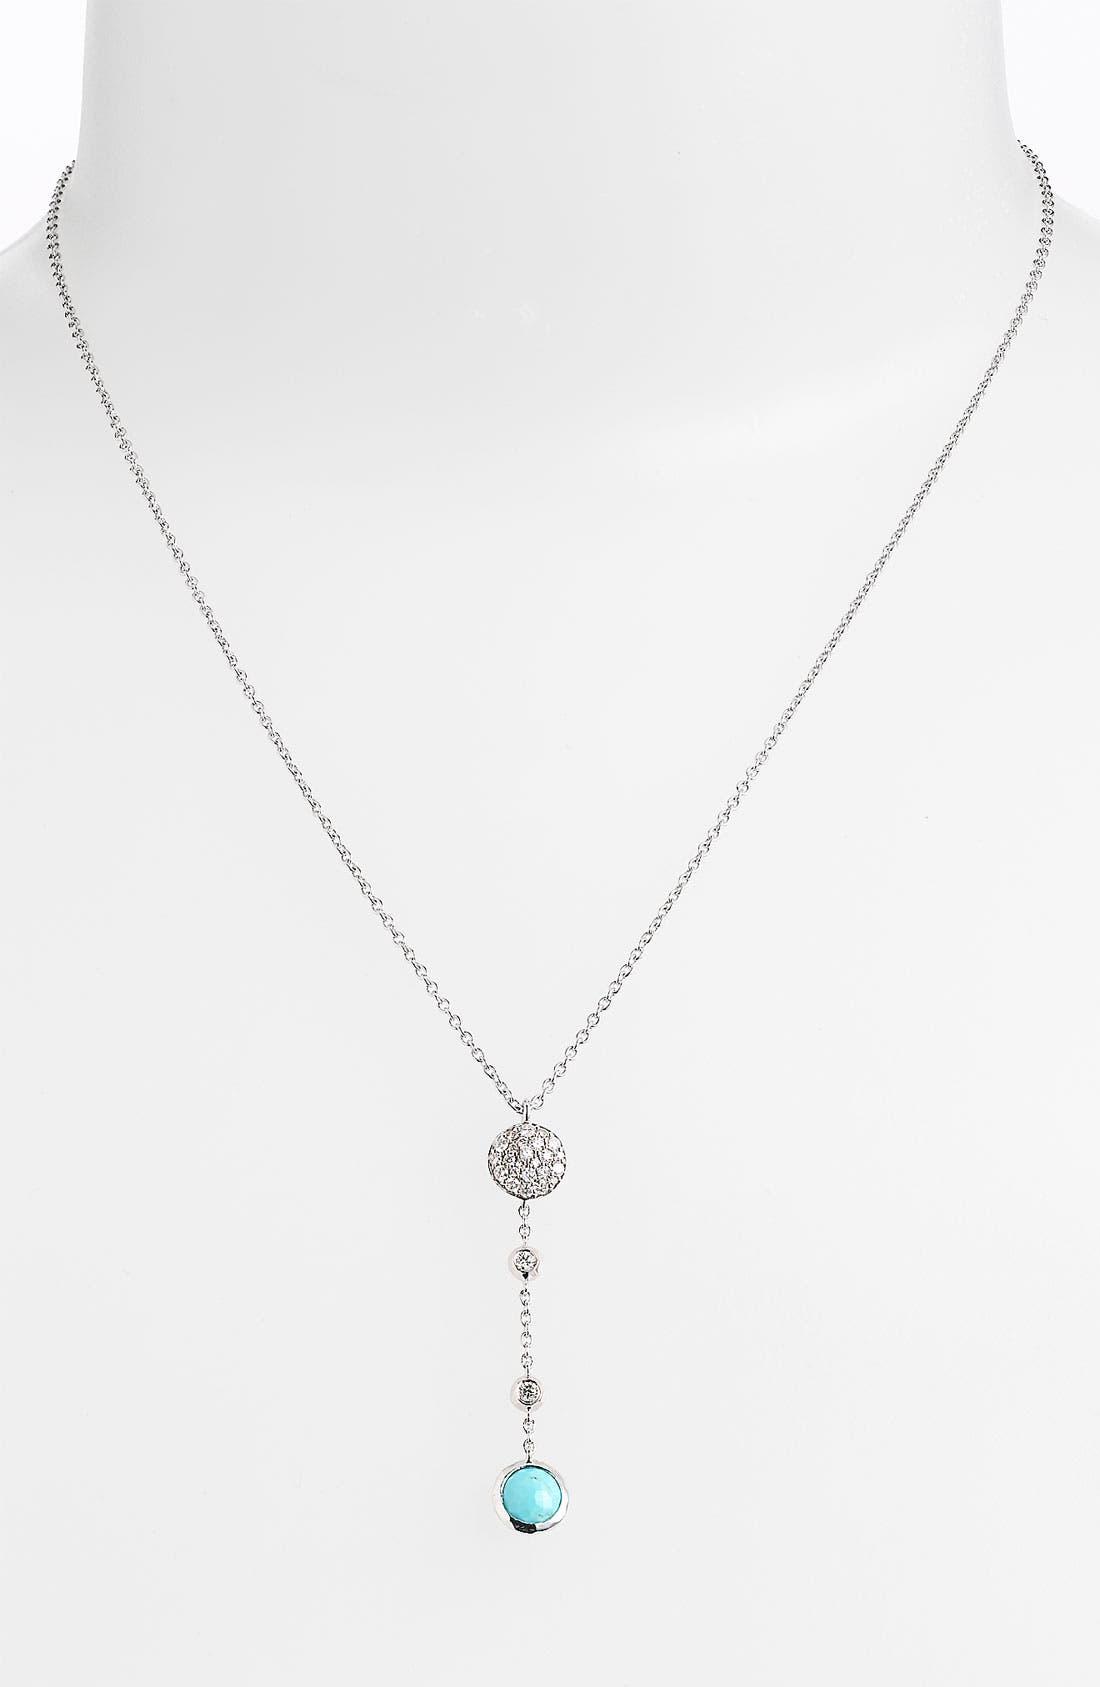 Alternate Image 1 Selected - Ippolita 'Silver Rain' Diamond & Stone Y-Necklace